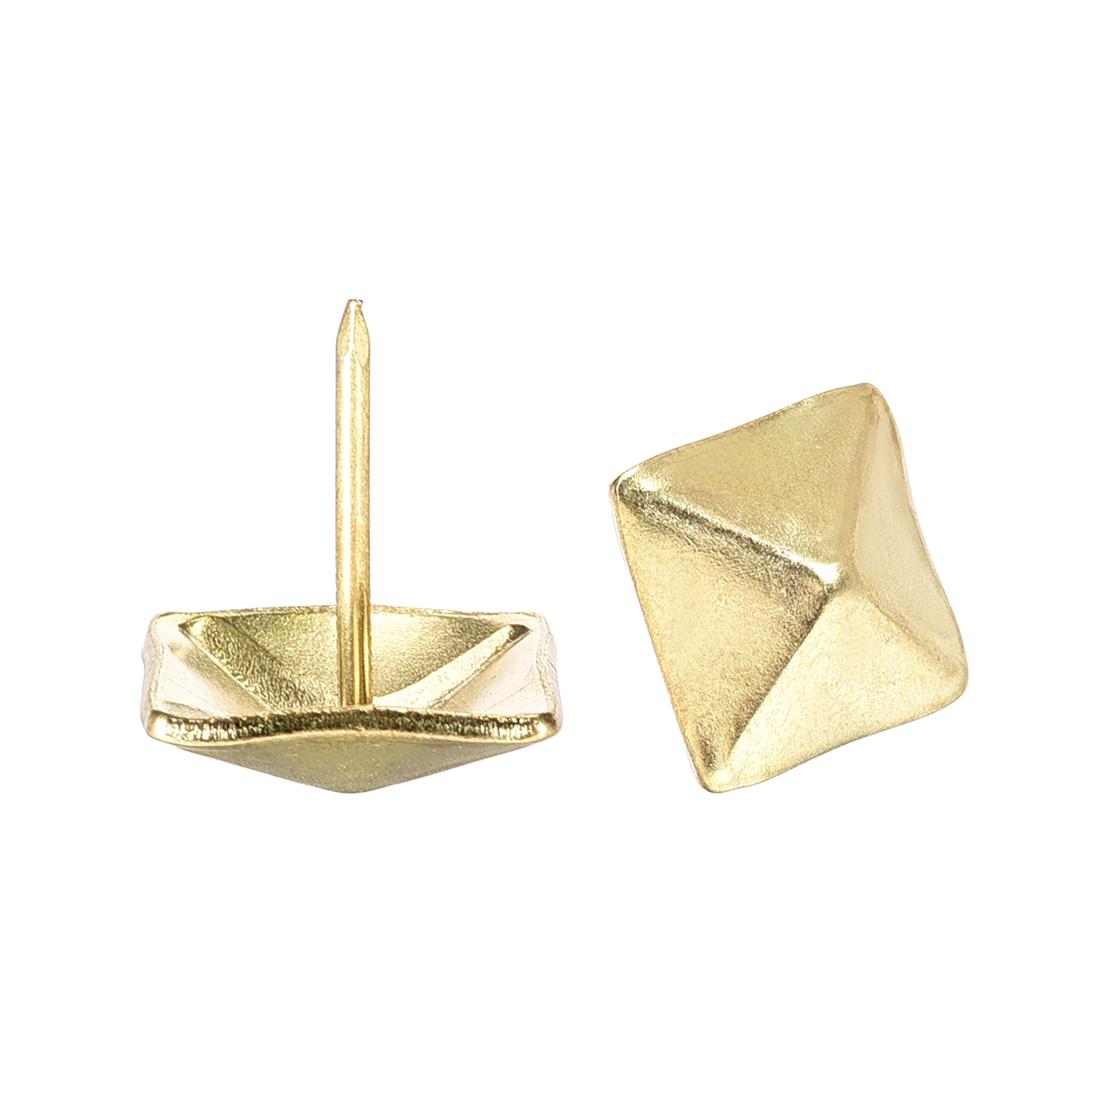 Upholstery Nails Tacks 19mm Square Head 21mm Height Nails Pins Gold Tone 20 Pcs